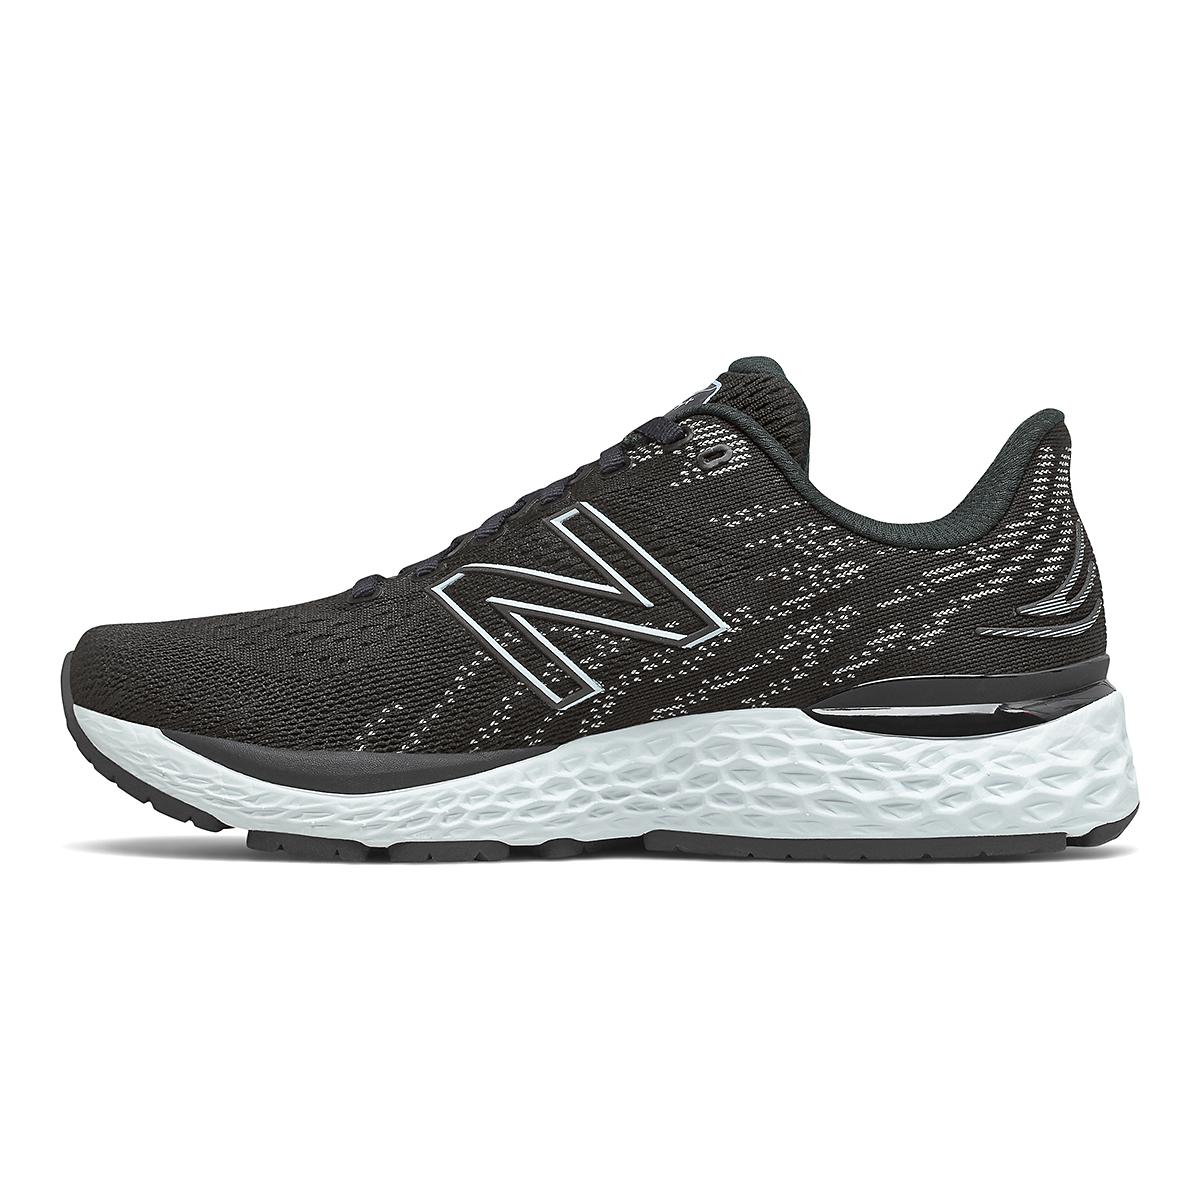 Women's New Balance 880V11 Running Shoe - Color: Black/Star Glo - Size: 5 - Width: Narrow, Black/Star Glo, large, image 2